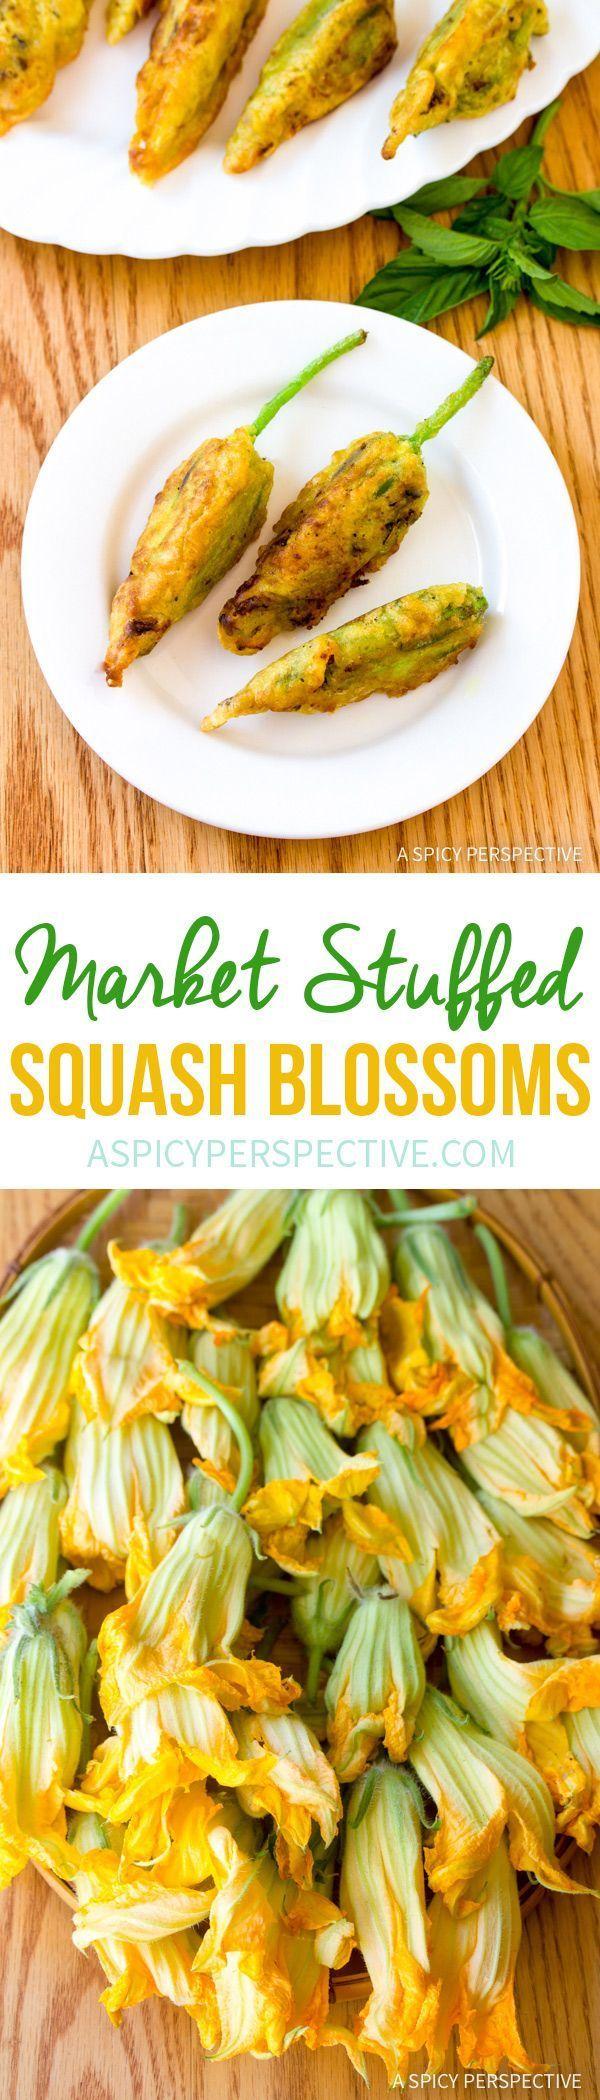 Fresh Market Stuffed Squash Blossoms Recipe via @spicyperspectiv